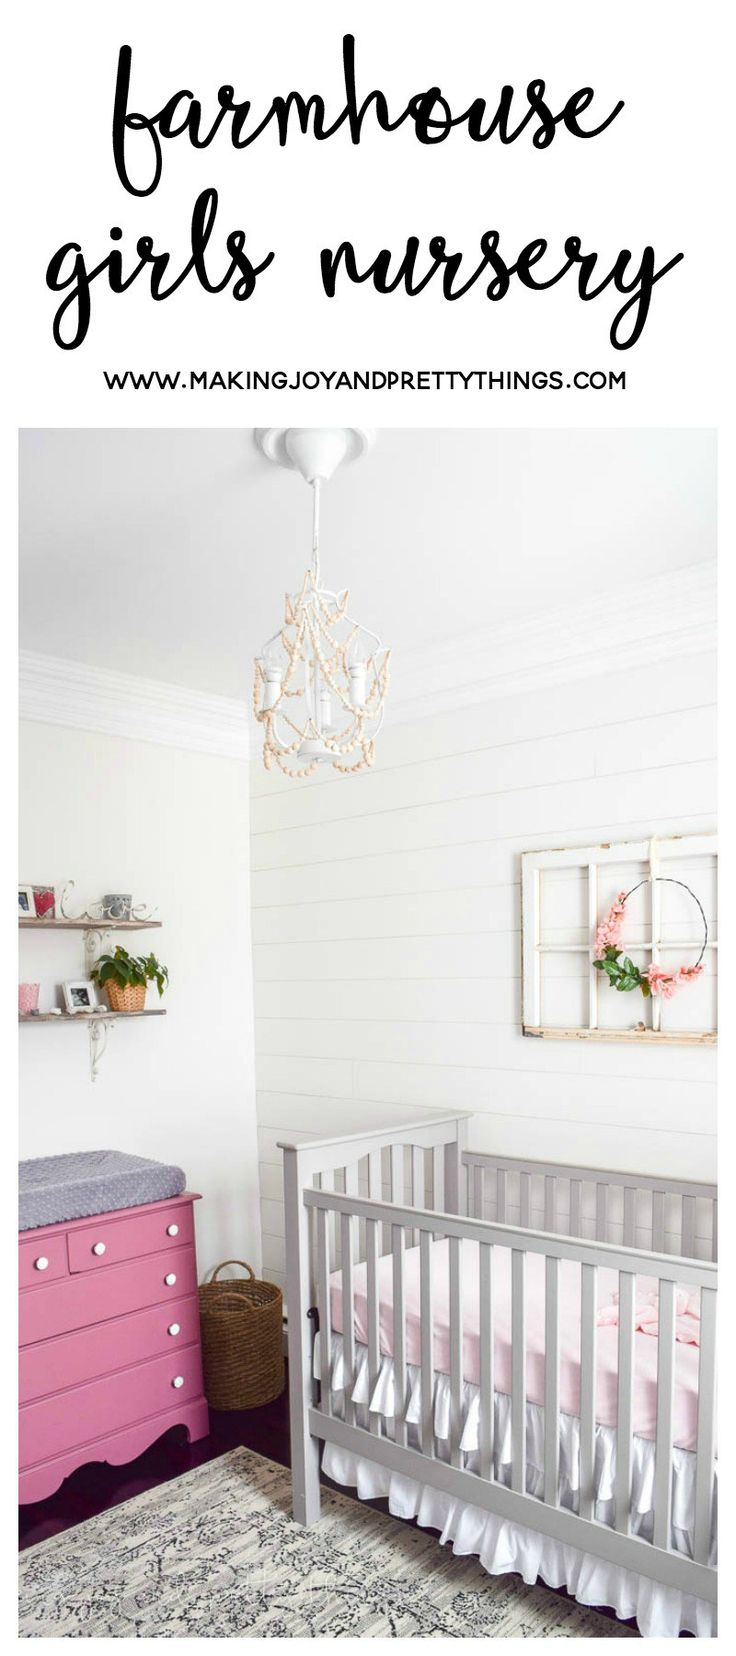 Pinterest Bedroom Themes